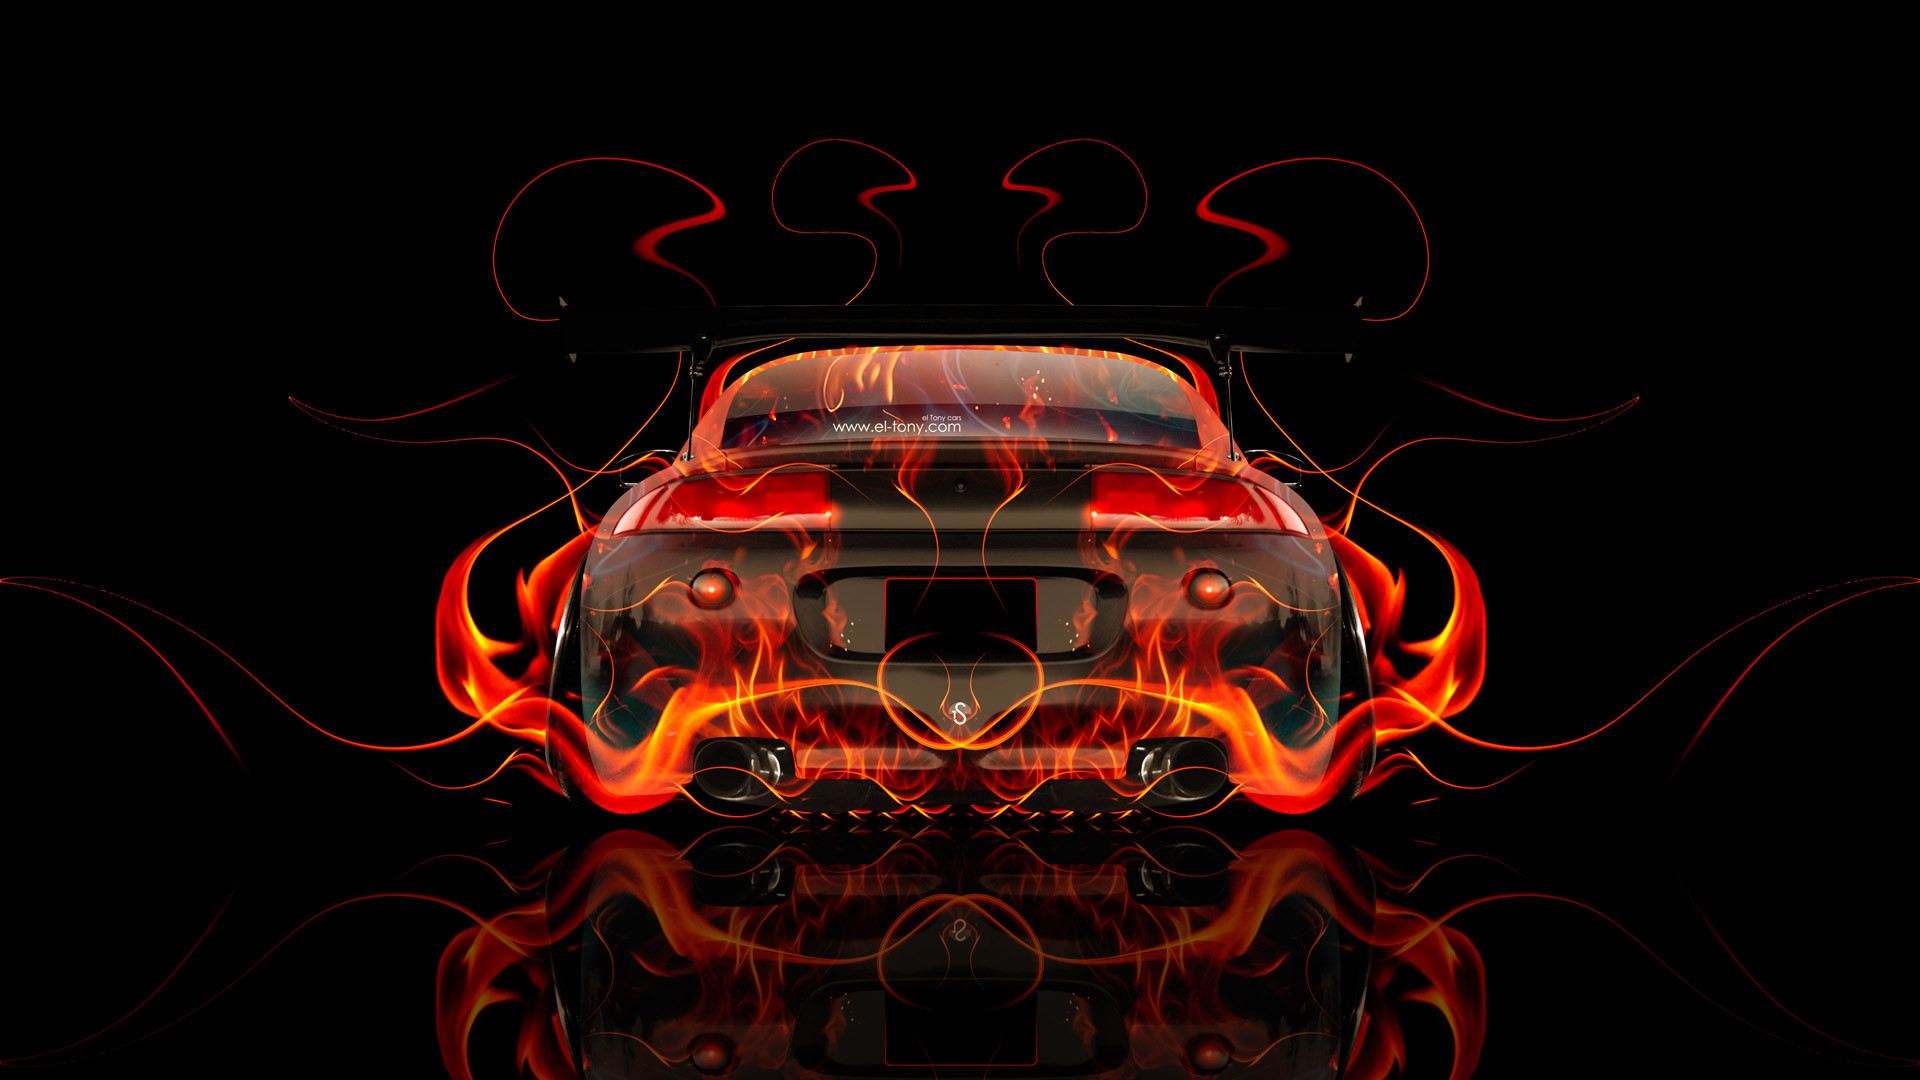 Mitsubishi Eclipse JDM Tuning Back Fire Car 2014